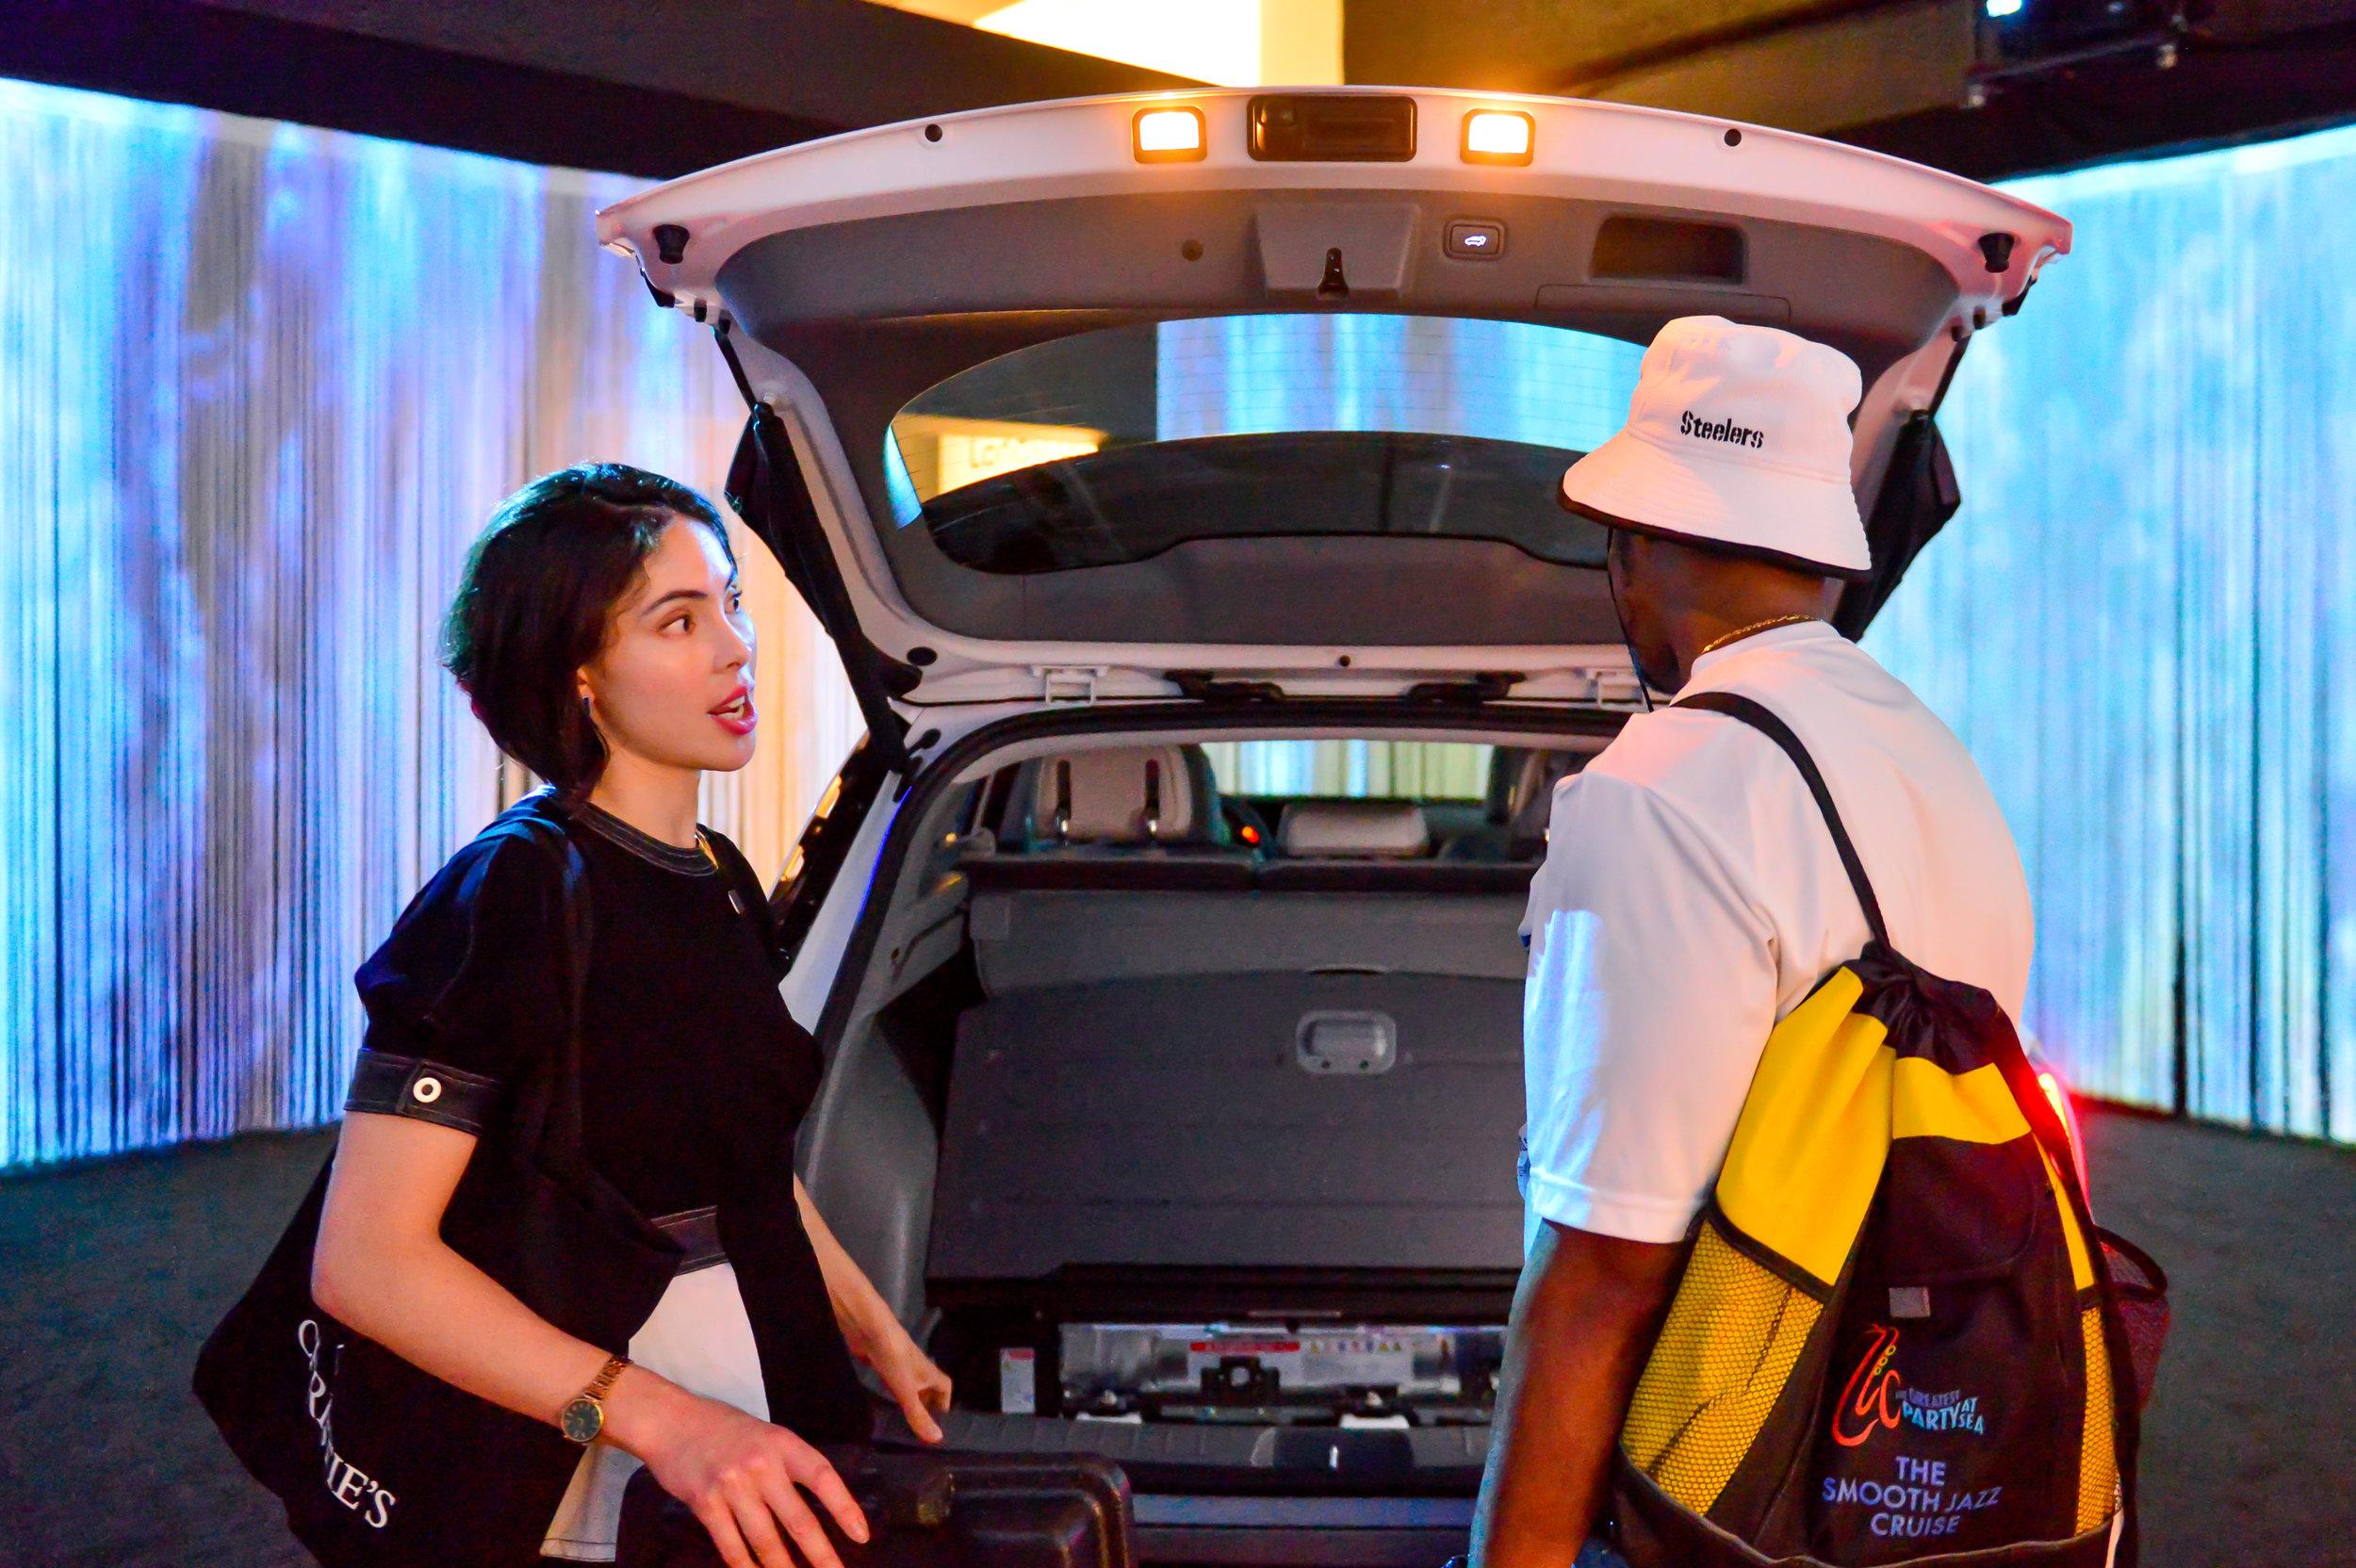 OHelloMedia-Hyundai-Christie'sAuctionHouse-6.26-TopSelect-6136.jpg